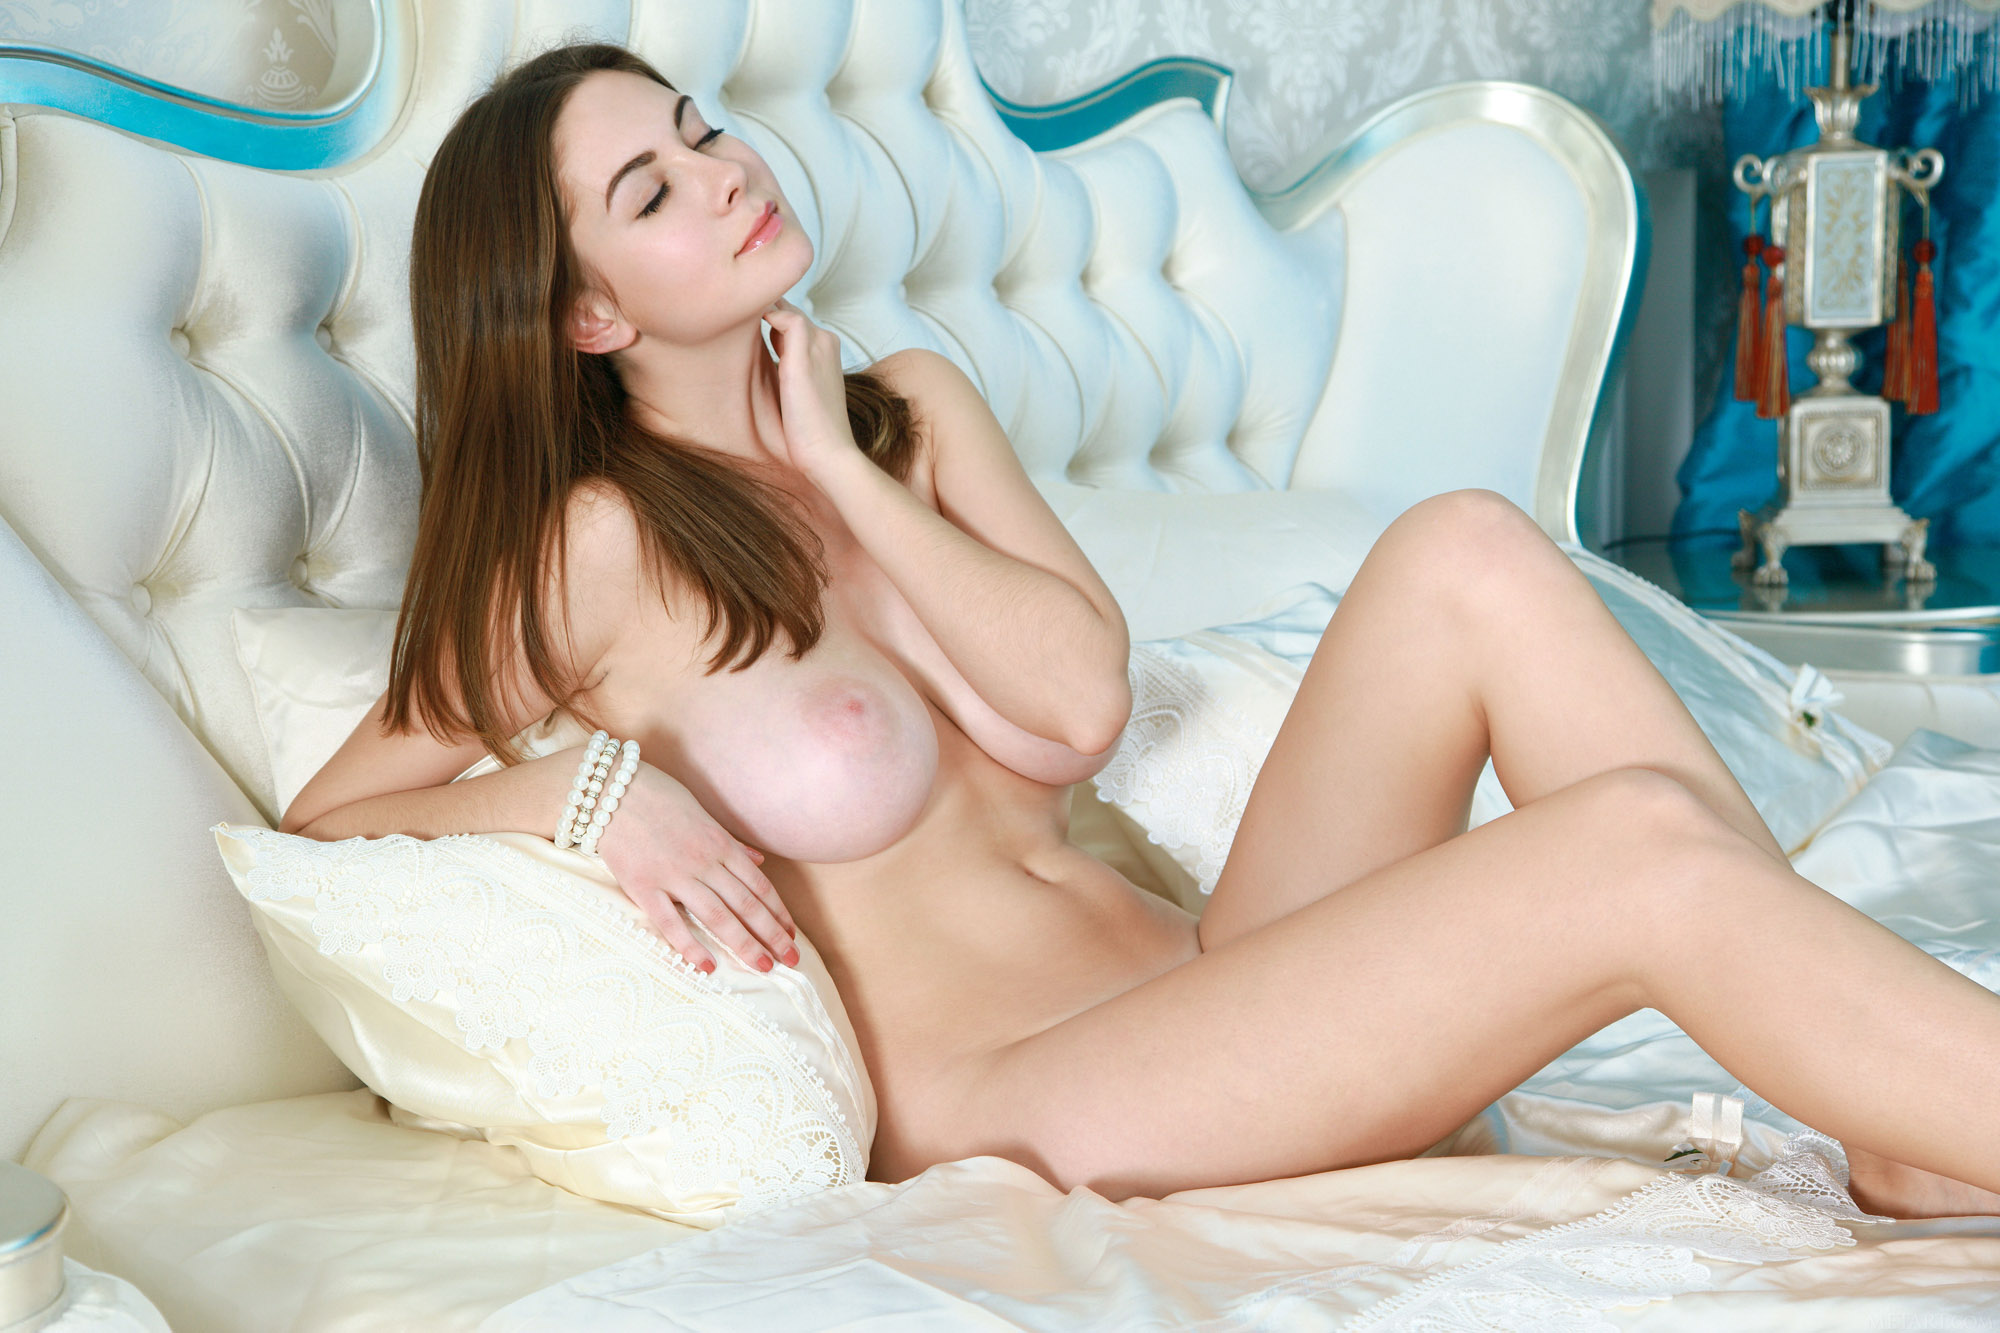 korean nude girl